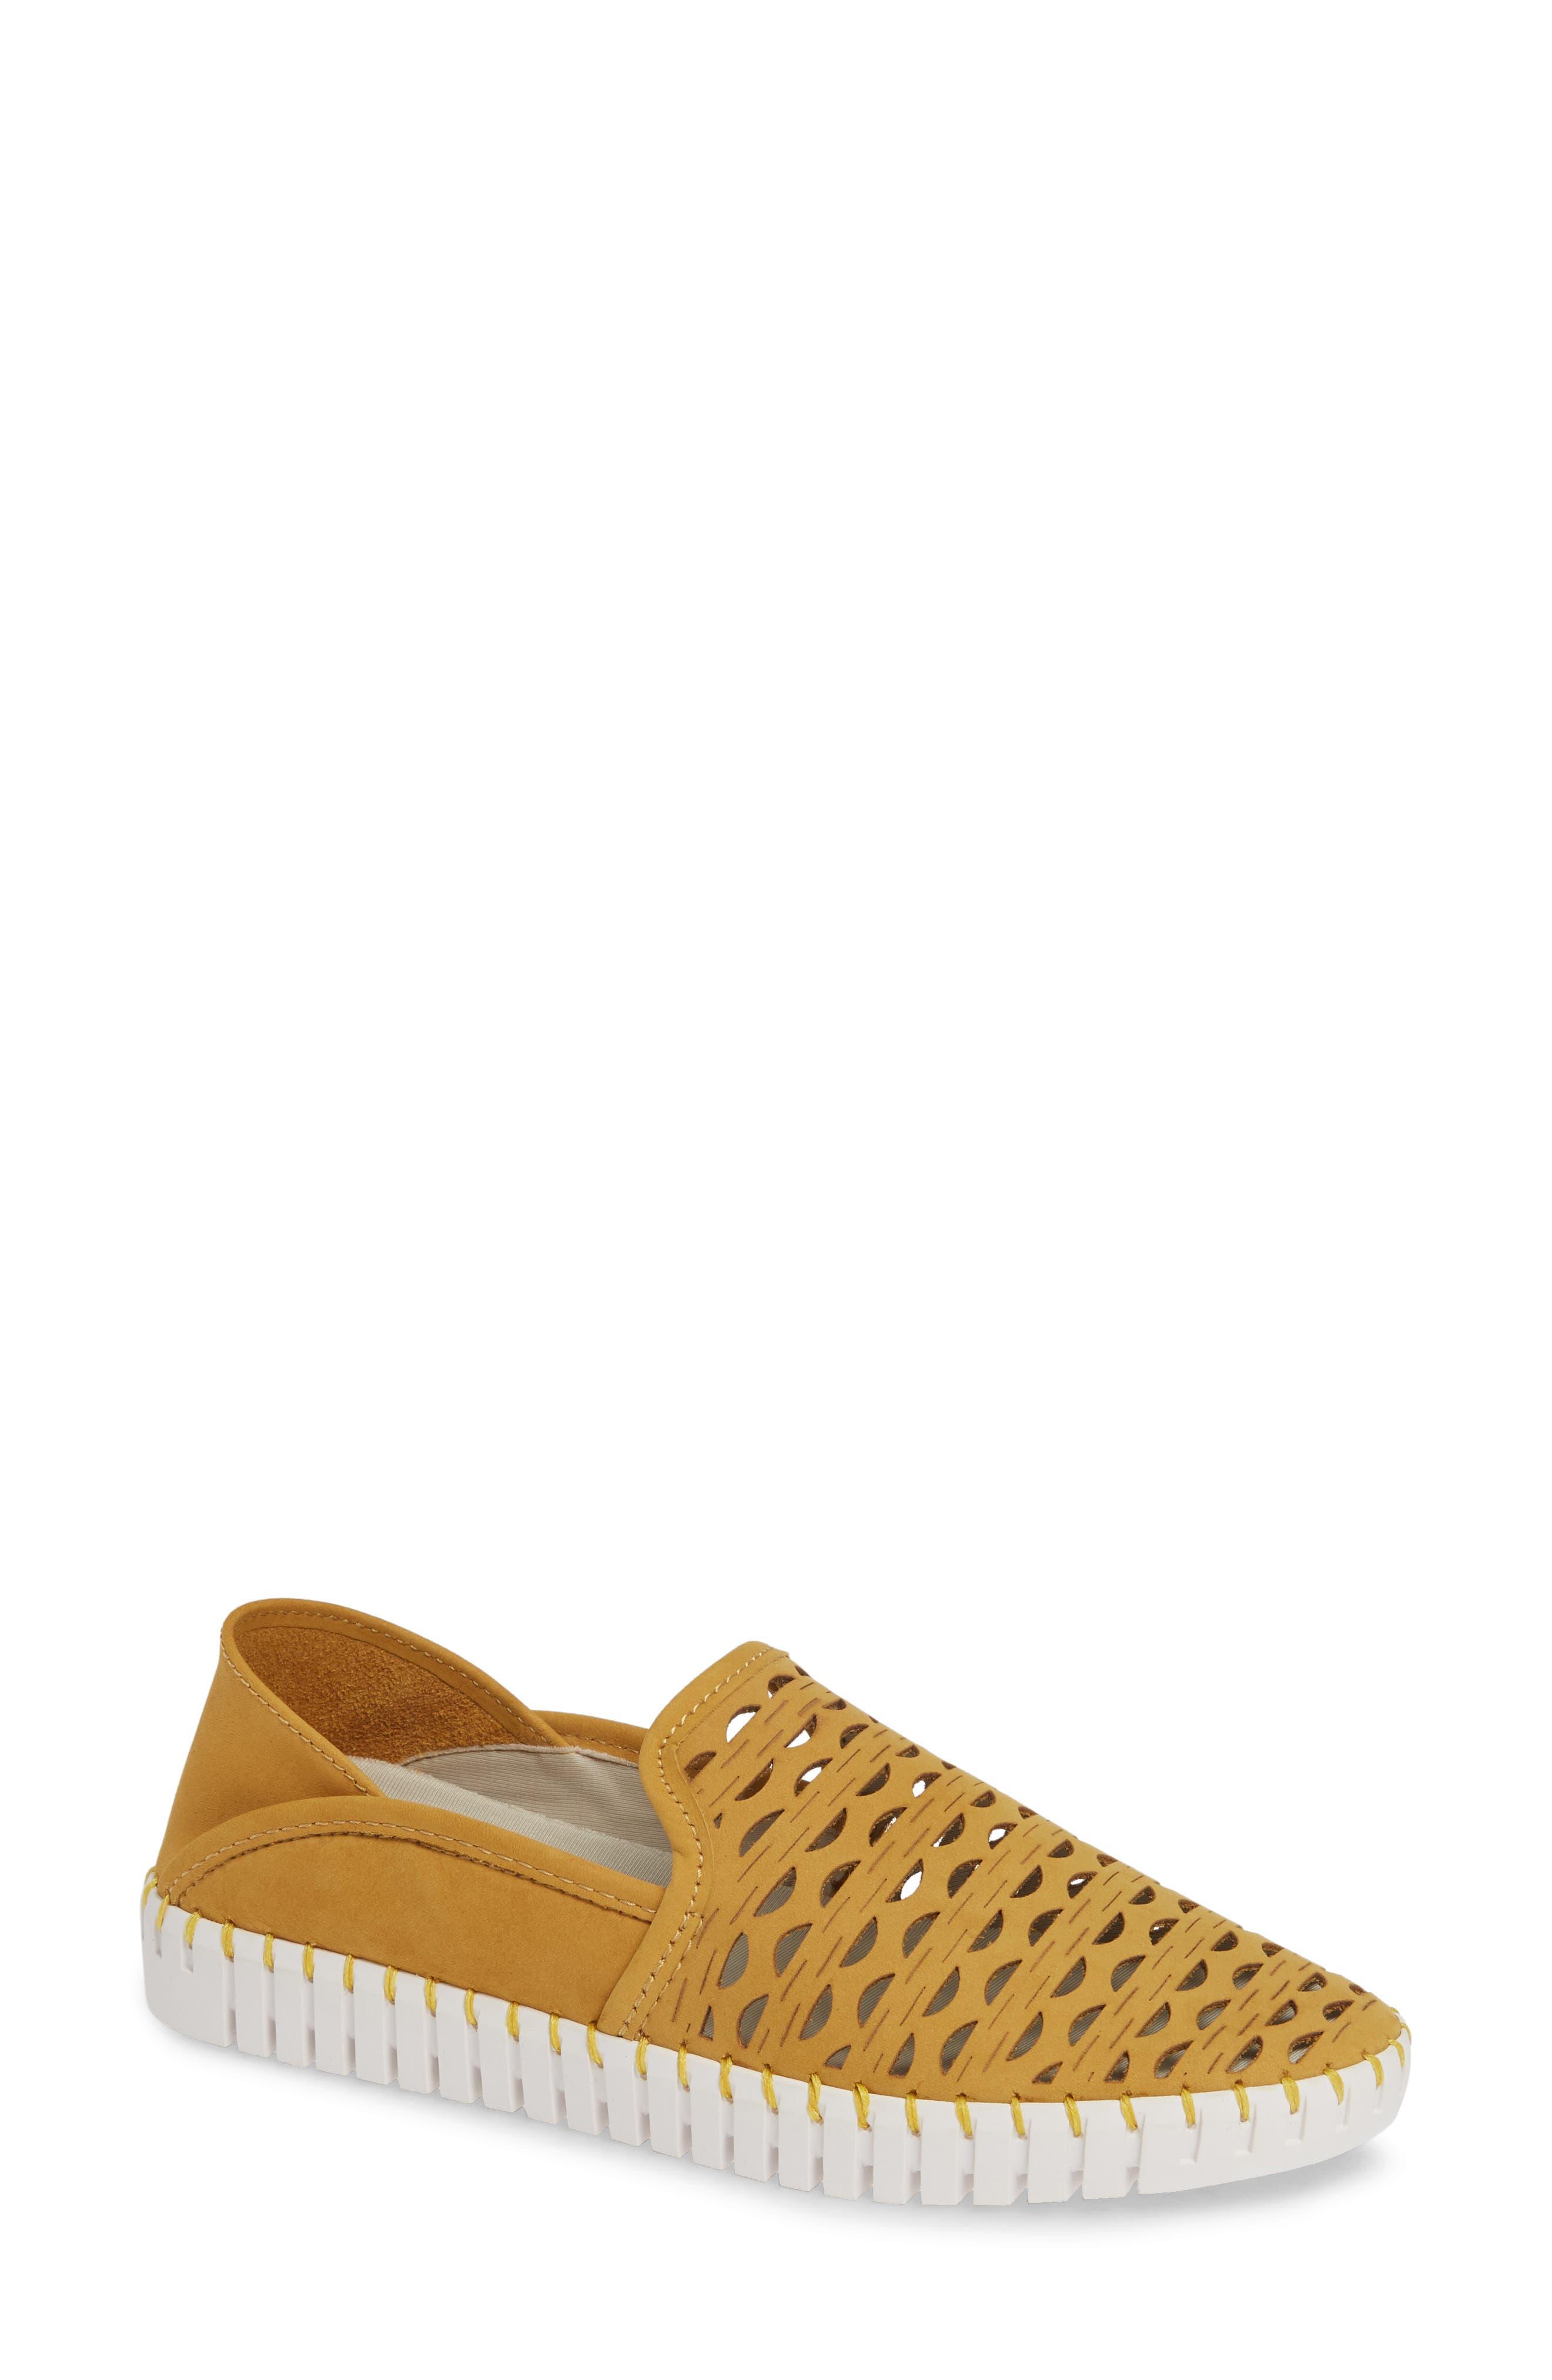 Janelle Perforated Slip-On in Mustard Perf Nubuck